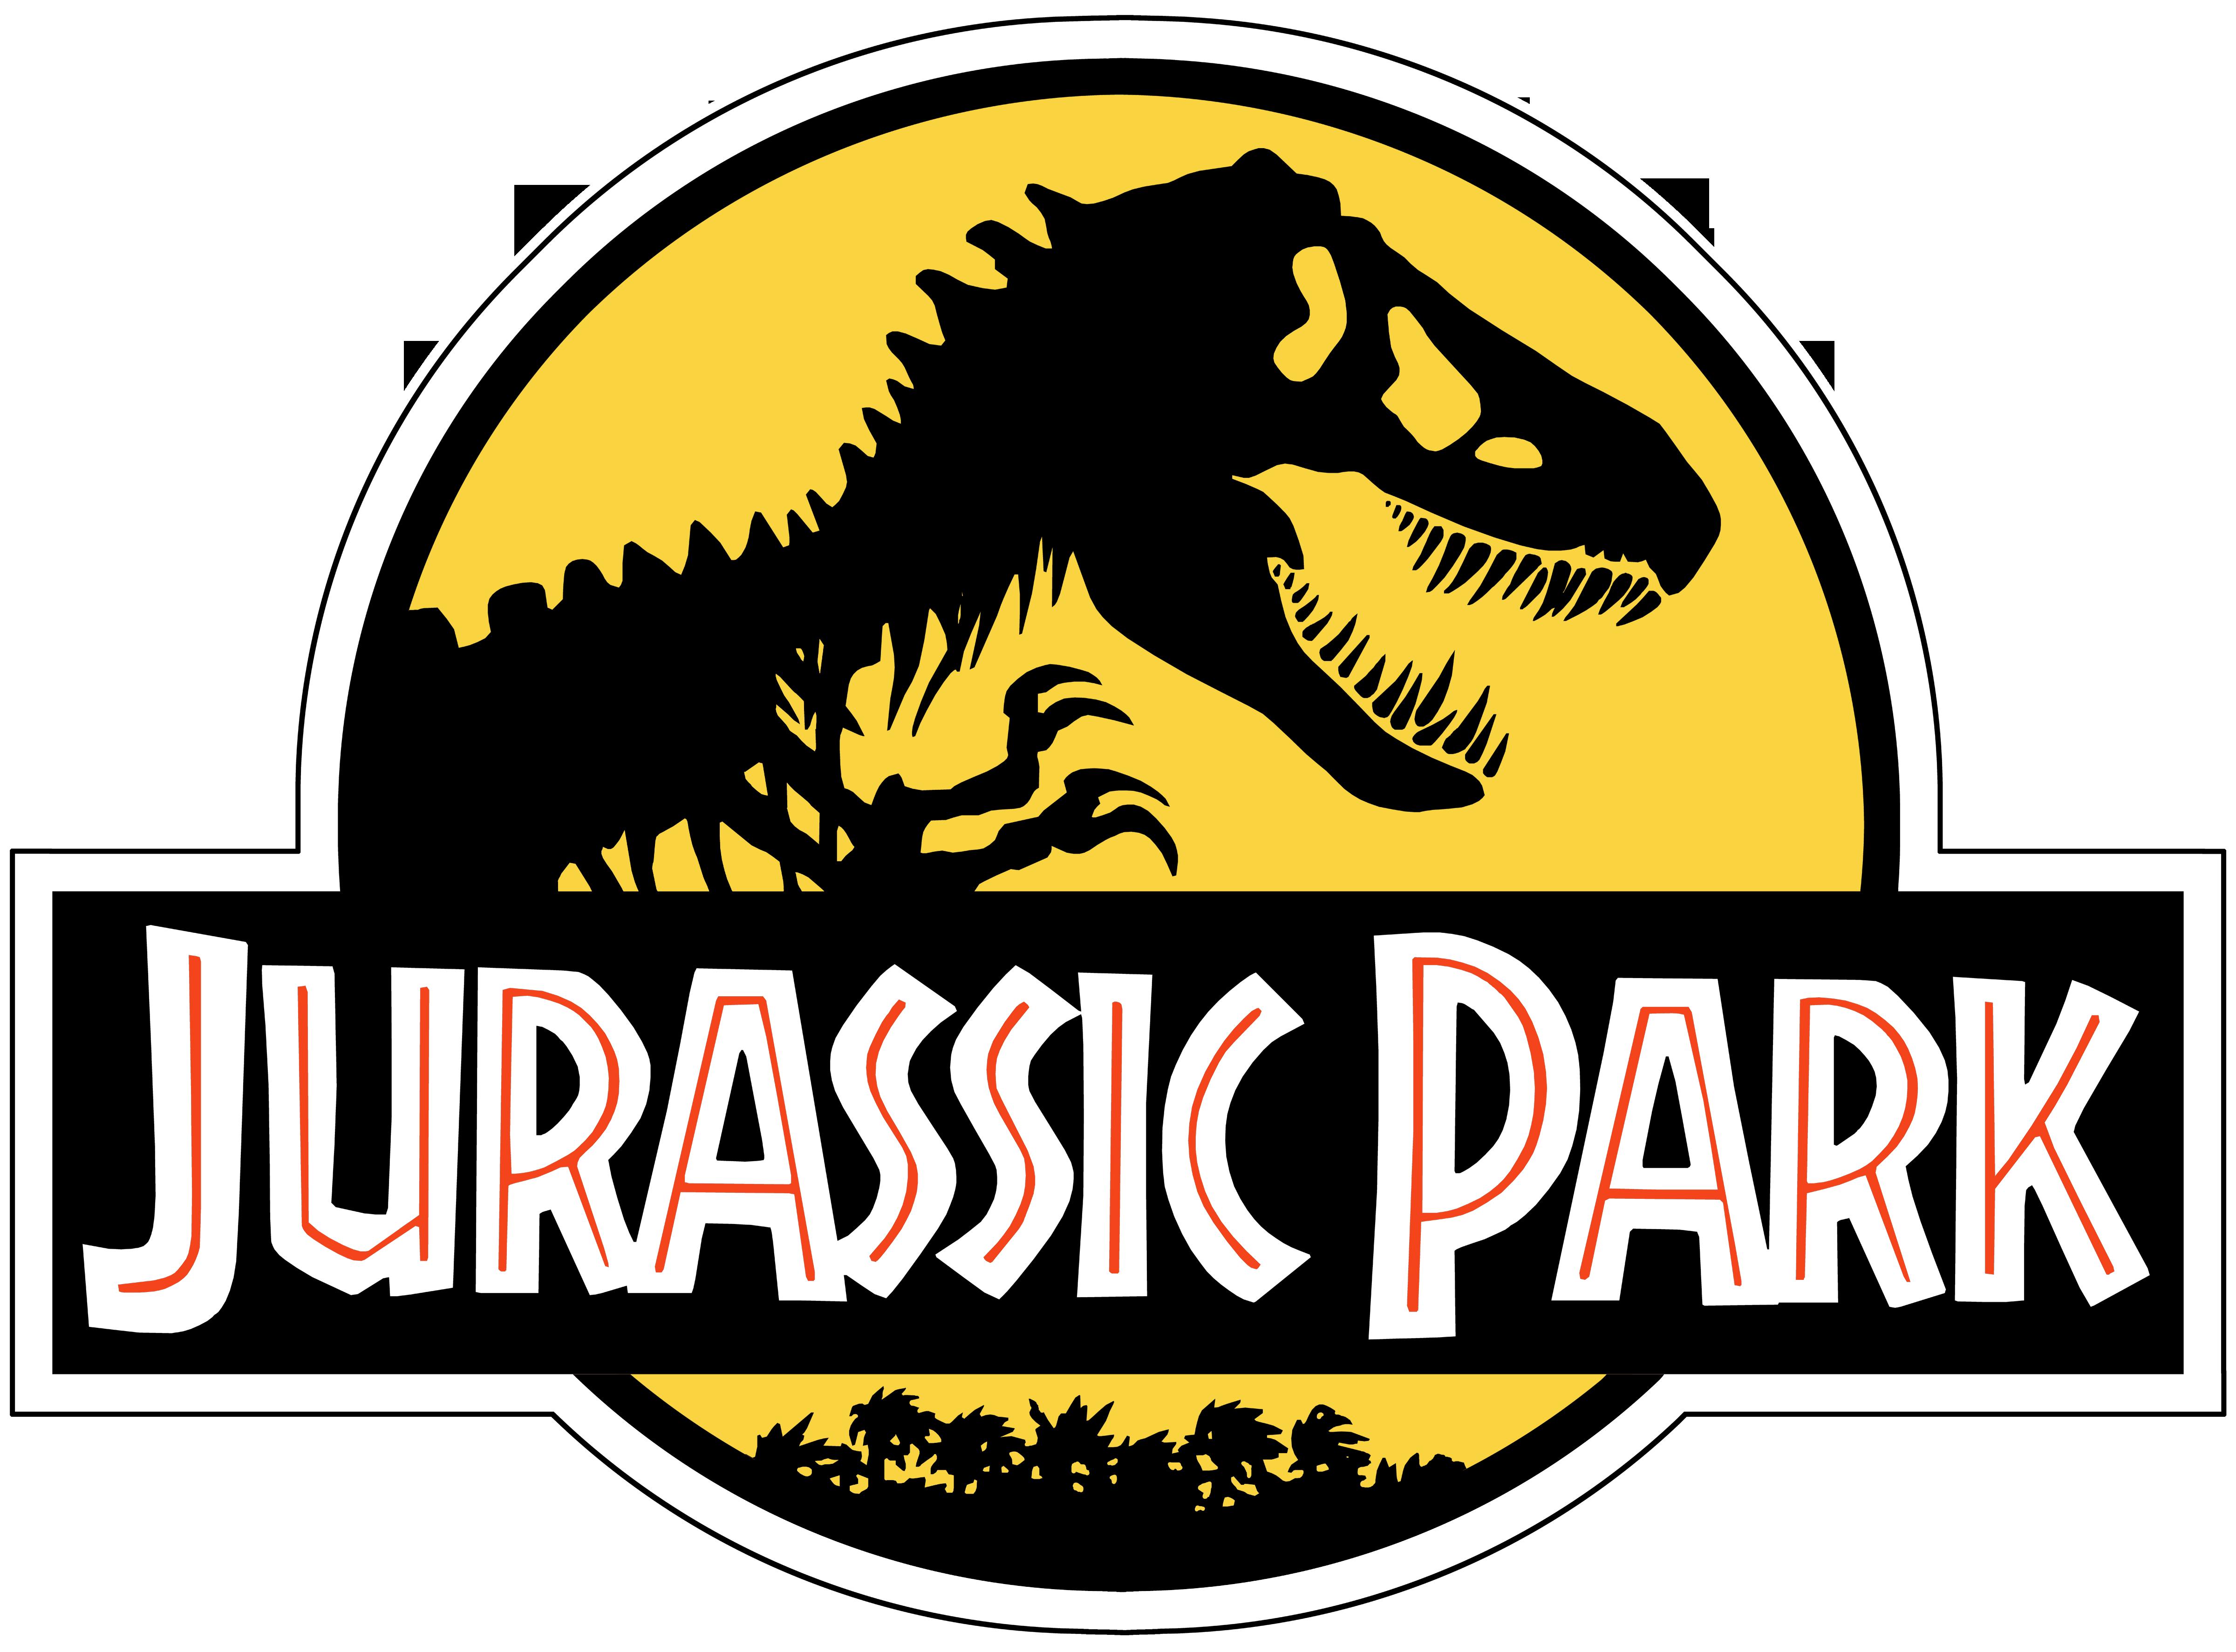 Jurassic park logo clipart jpg transparent download Jurassic clipart - ClipartFest jpg transparent download